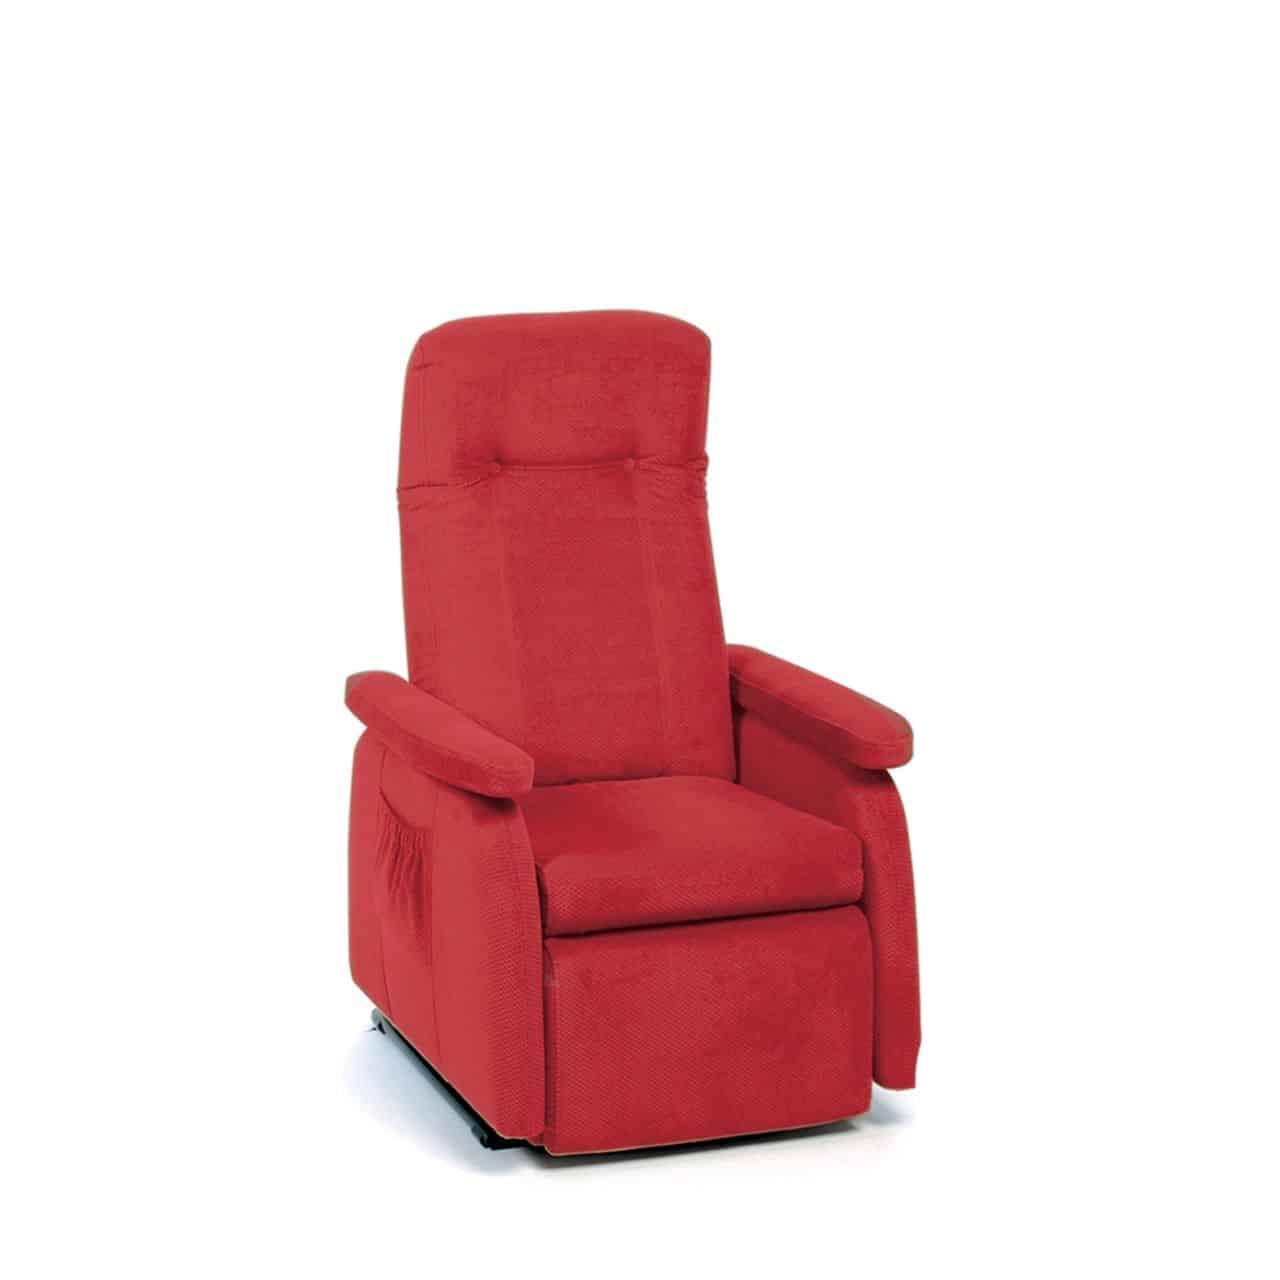 Modulair sta-op fauteuil